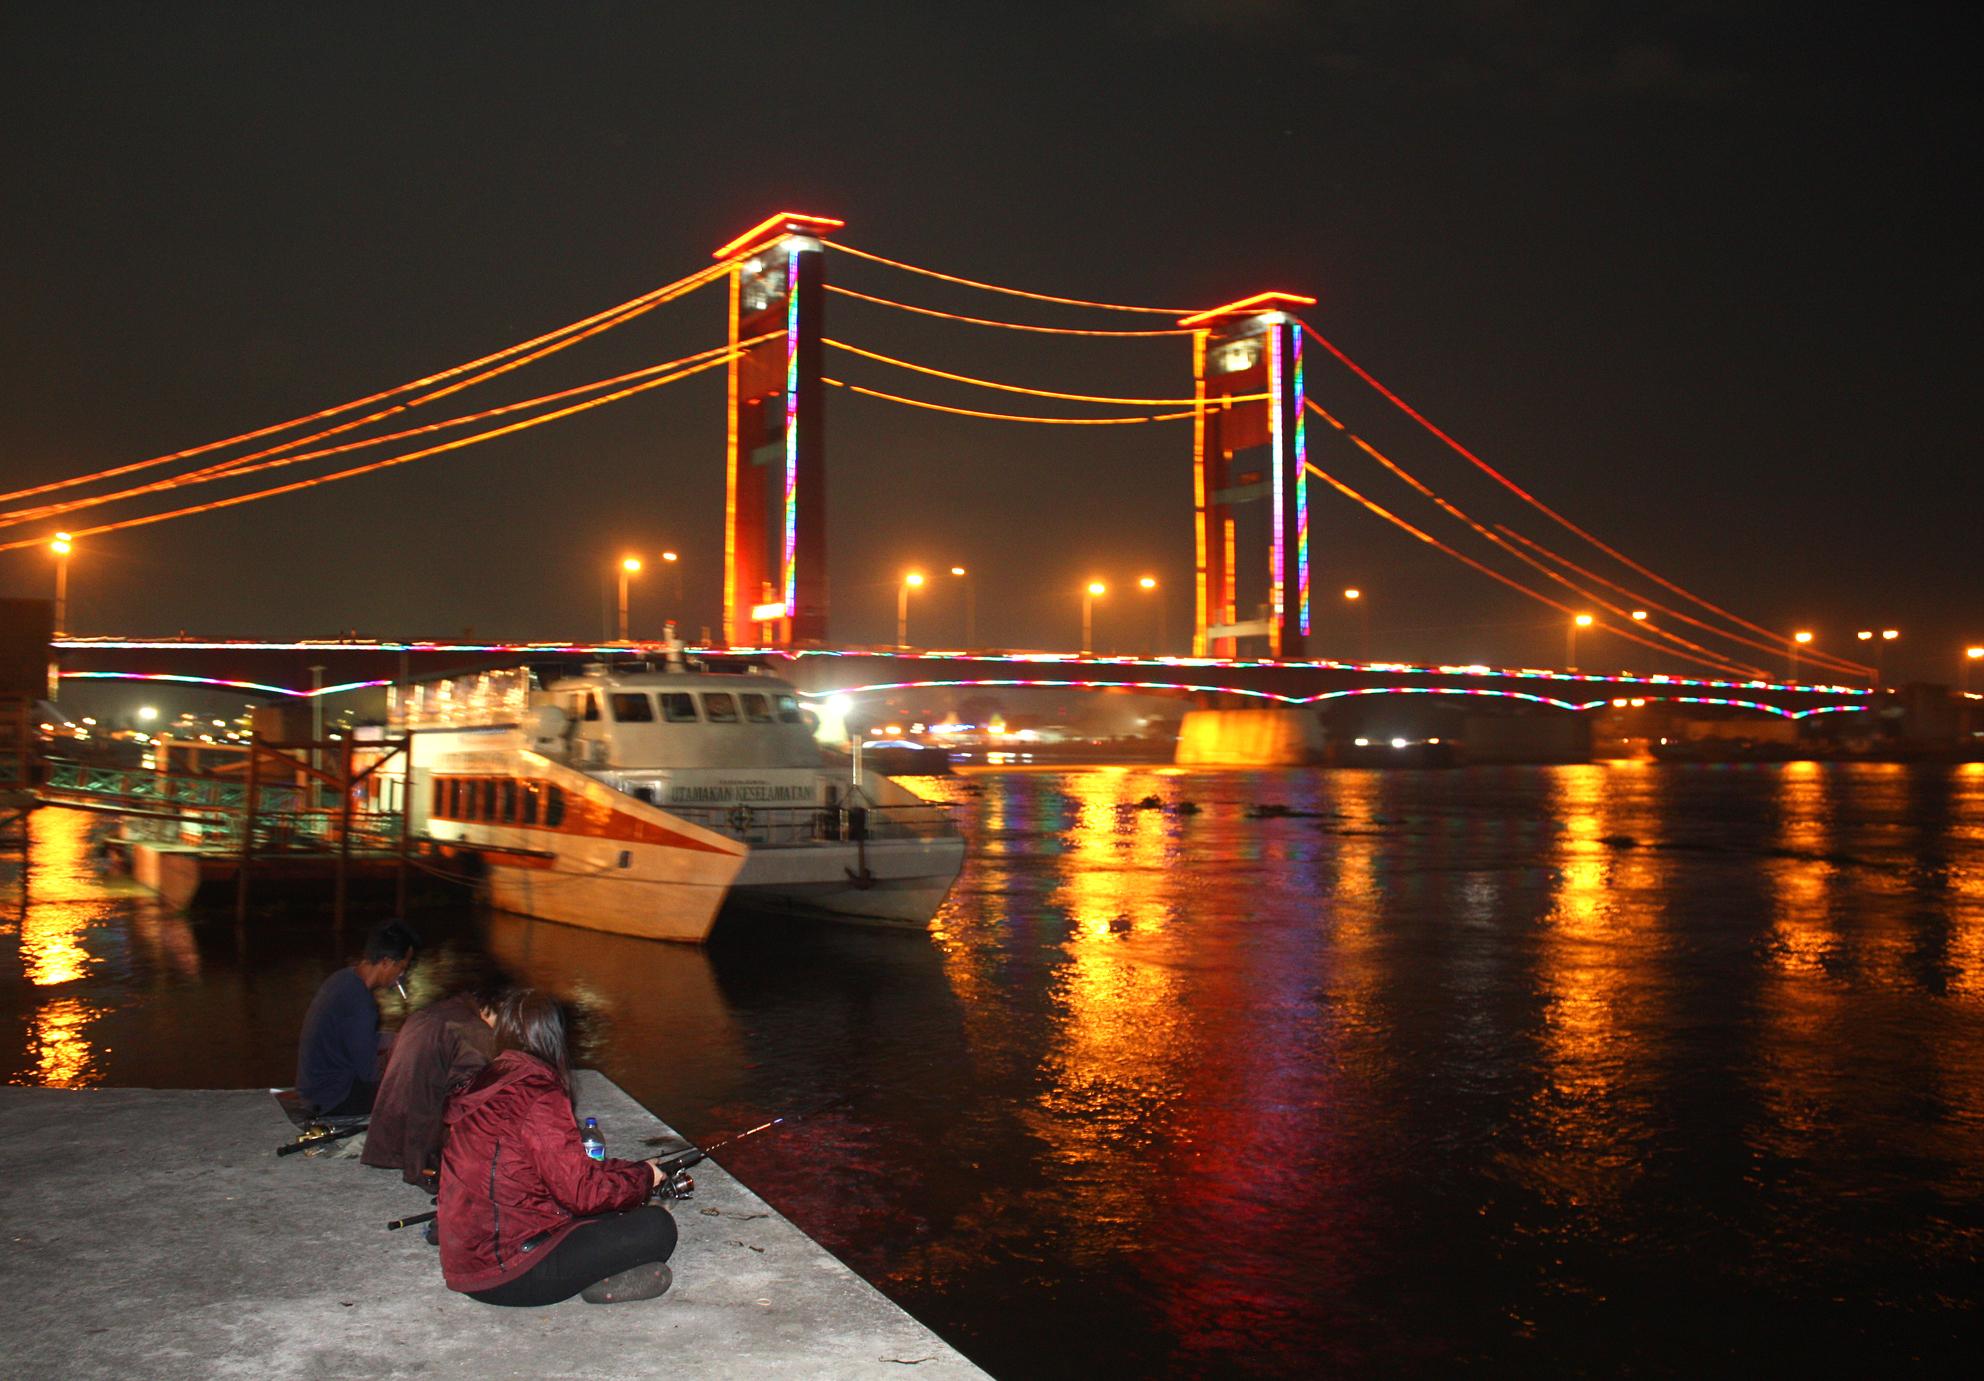 File:Ampera Bridge at Night, Palembang.jpg - Wikimedia Commons